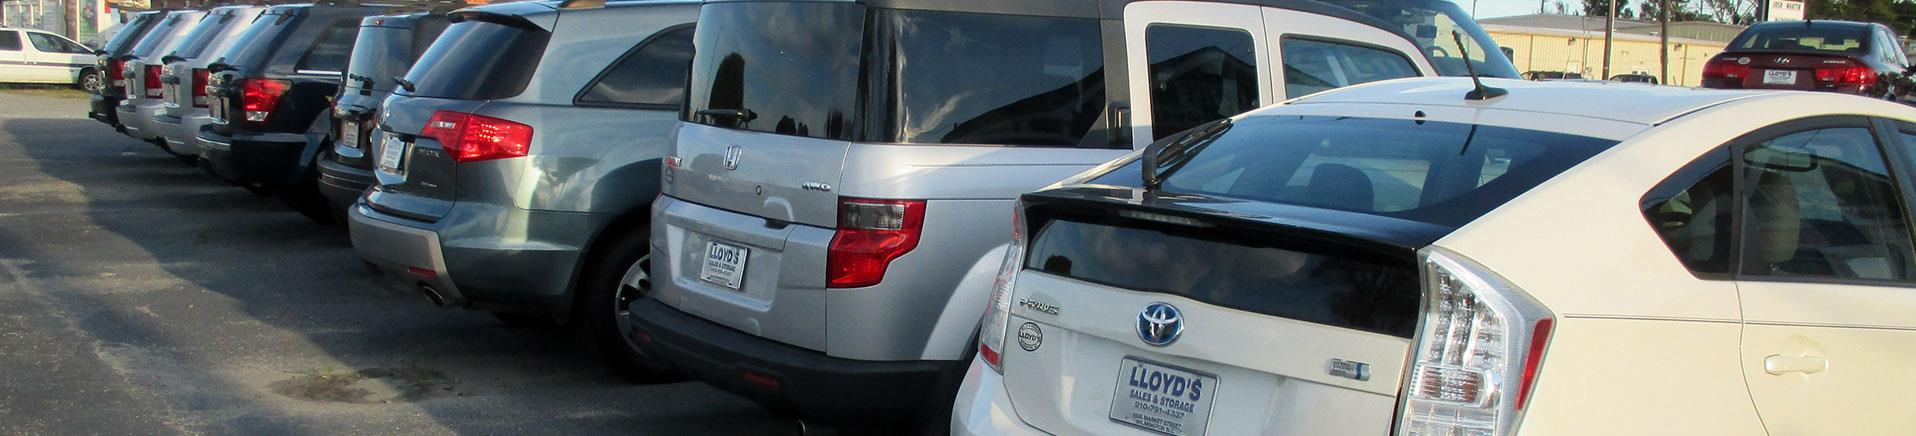 Used Cars Wilmington Nc >> Used Cars Wilmington Nc Used Cars Trucks Nc Lloyd S Sales And